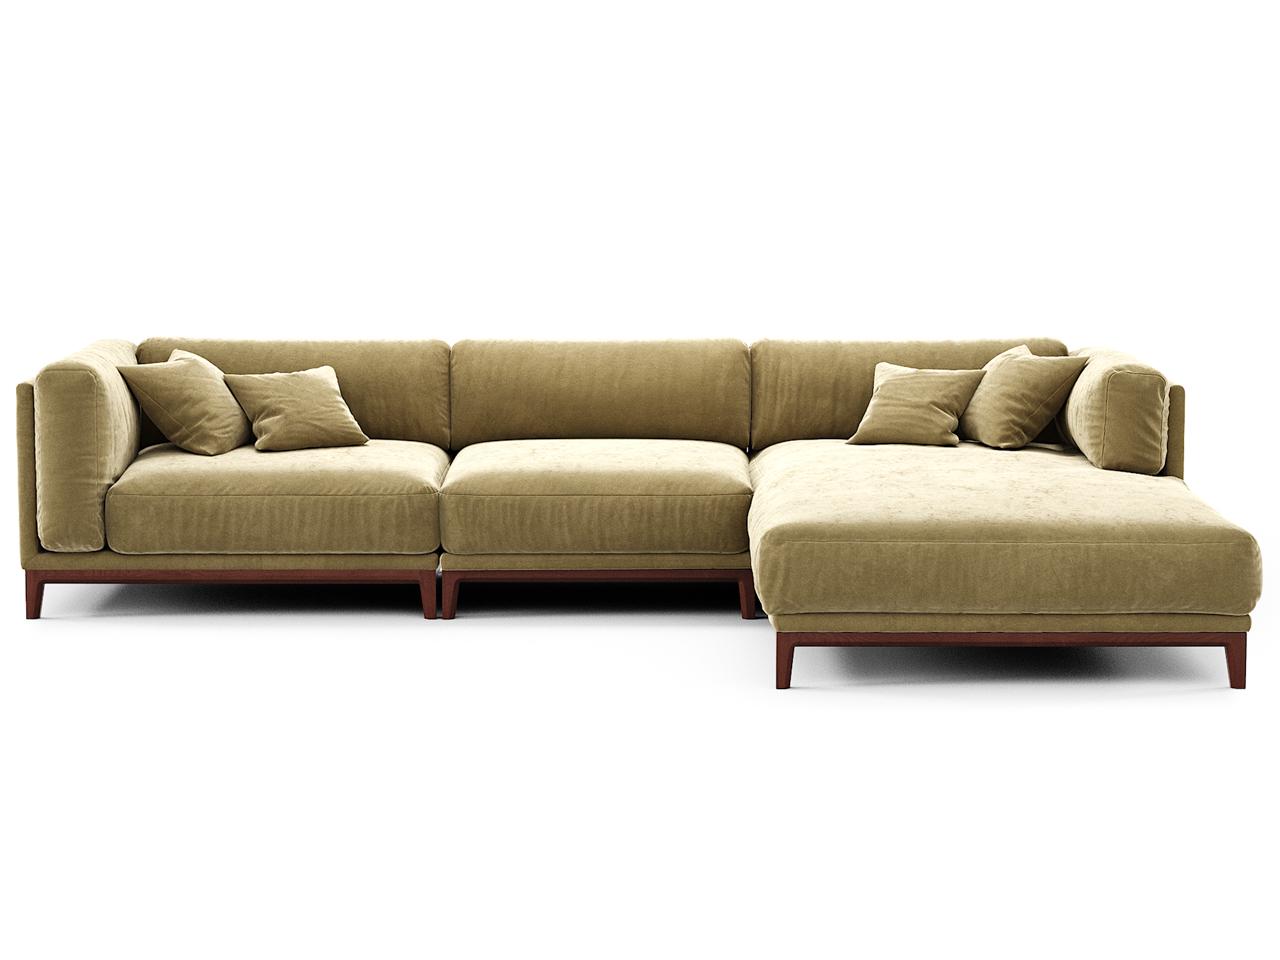 The idea диван case бежевый 108253/4